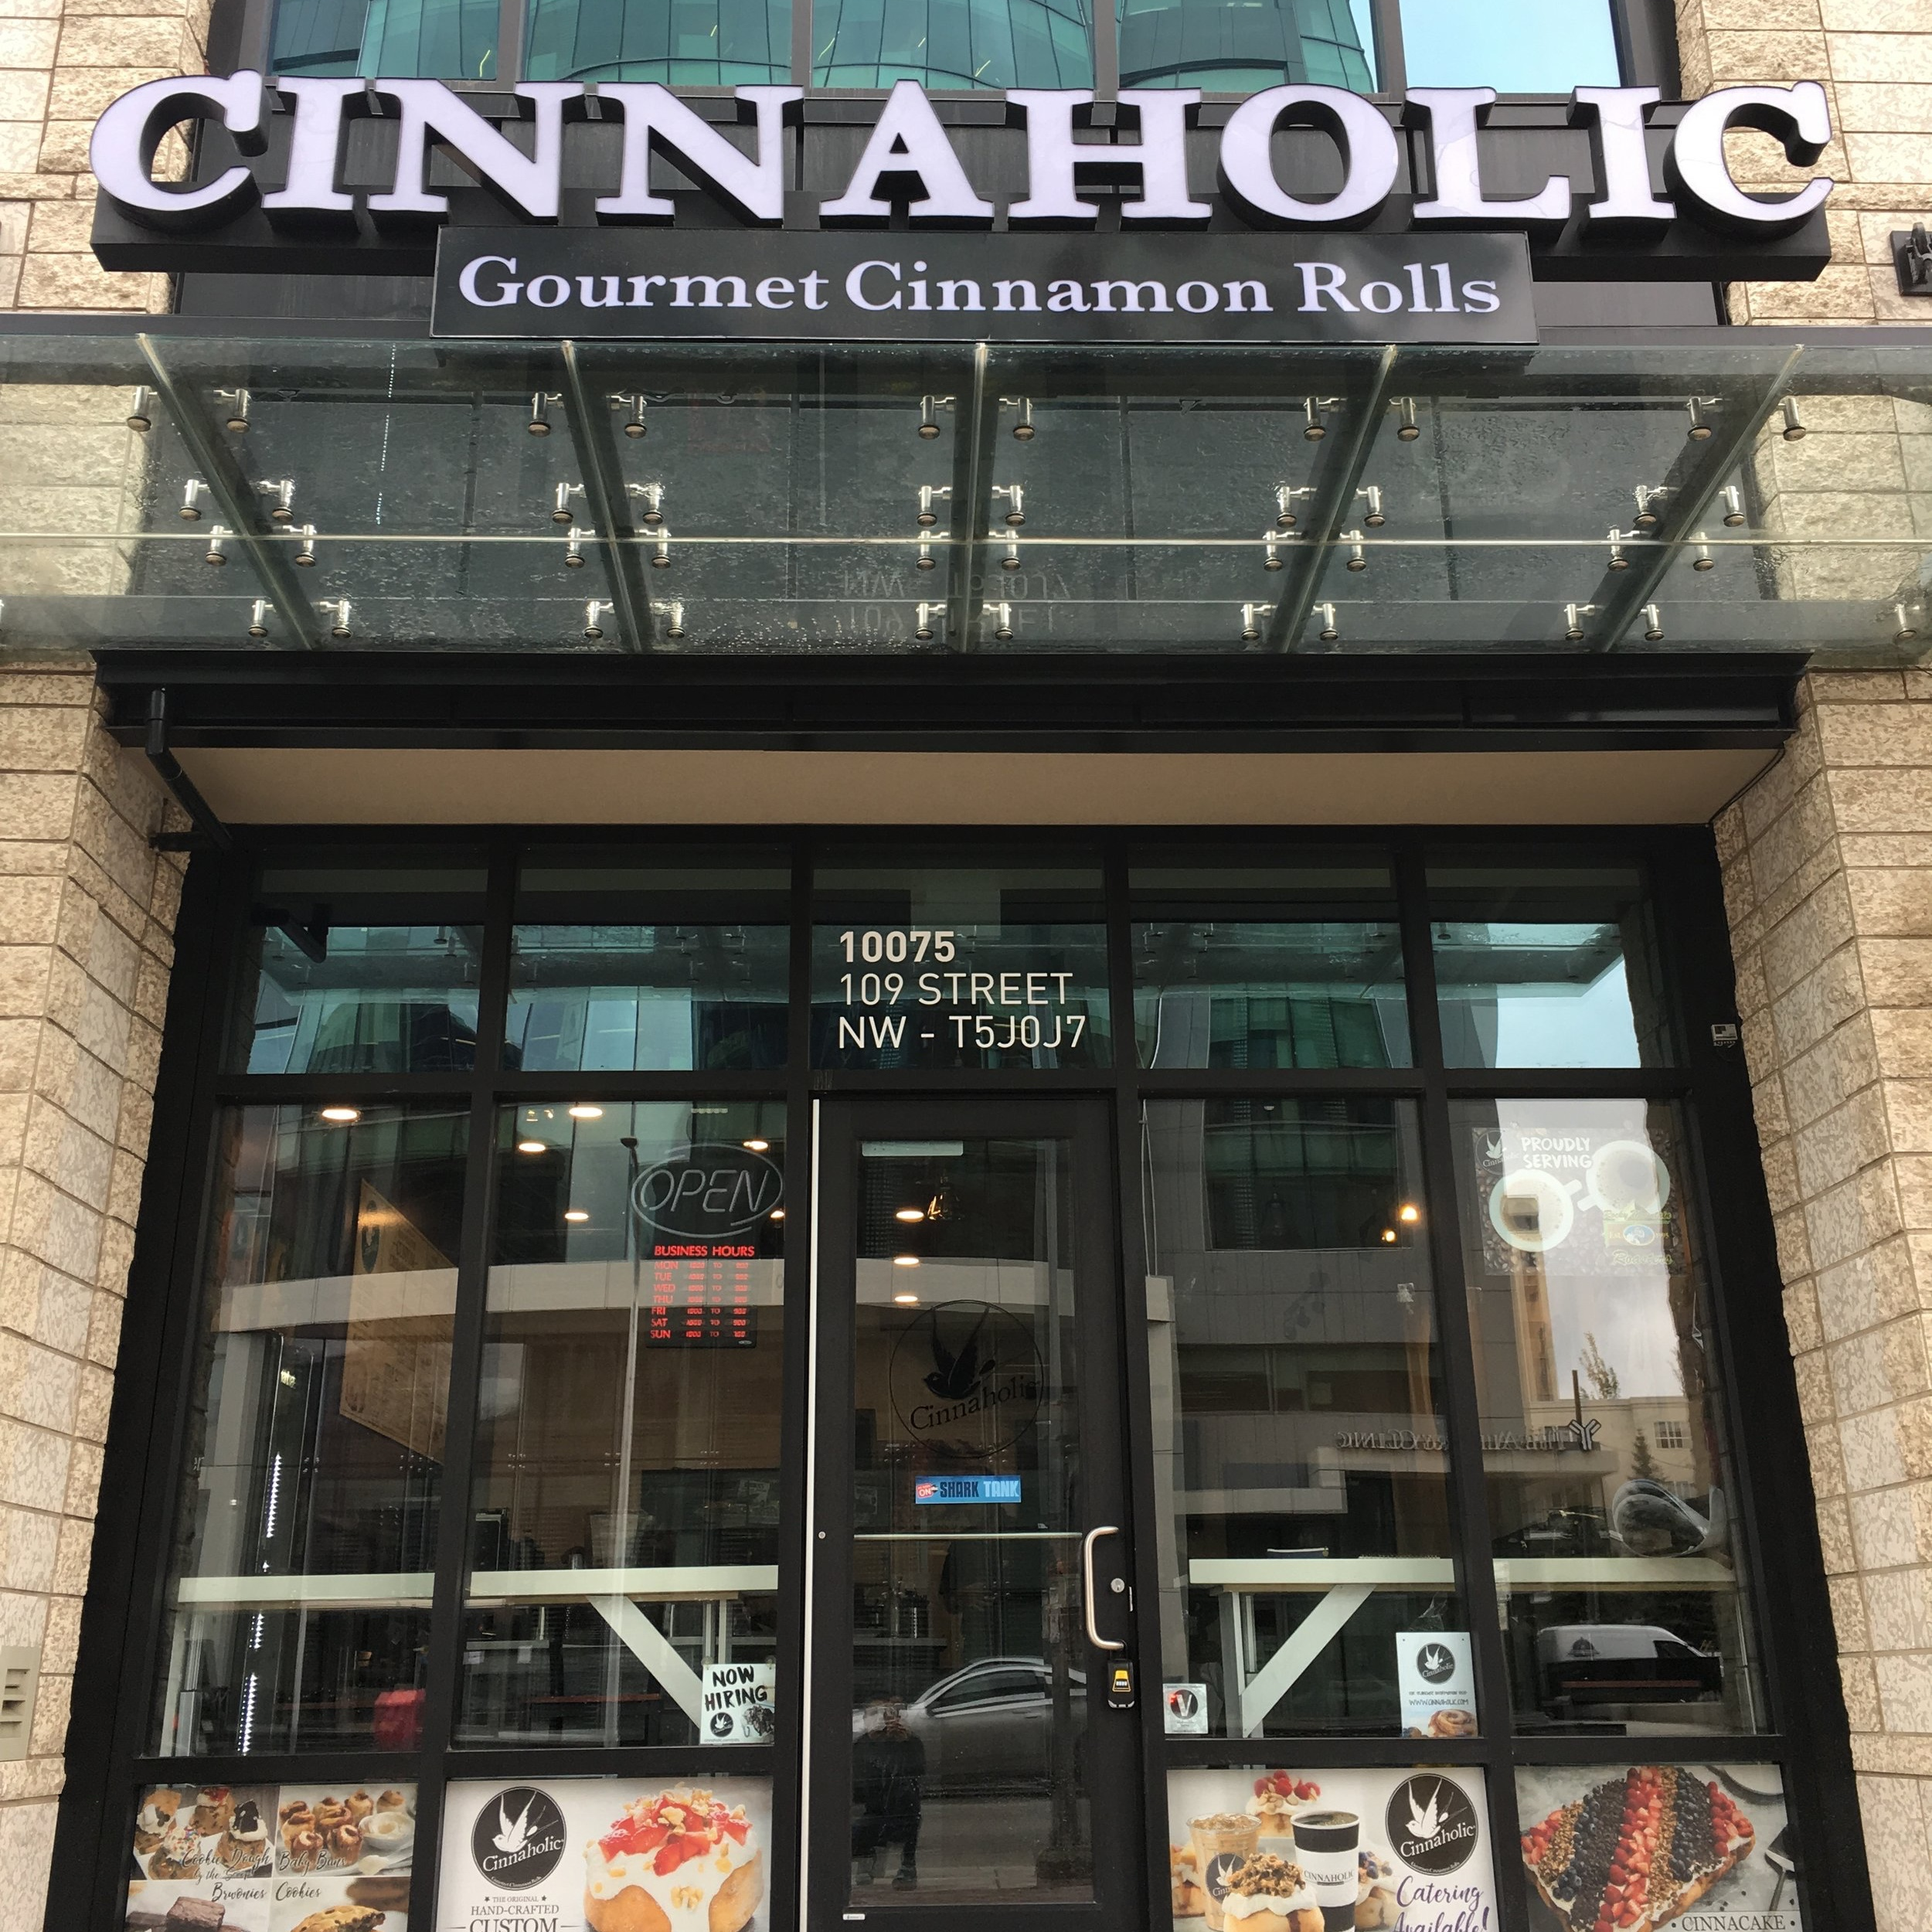 Cinnaholic Edmonton - Downtown - 10075 109ST NWEDMONTON, AB T5J 0J7(587) 521-2111